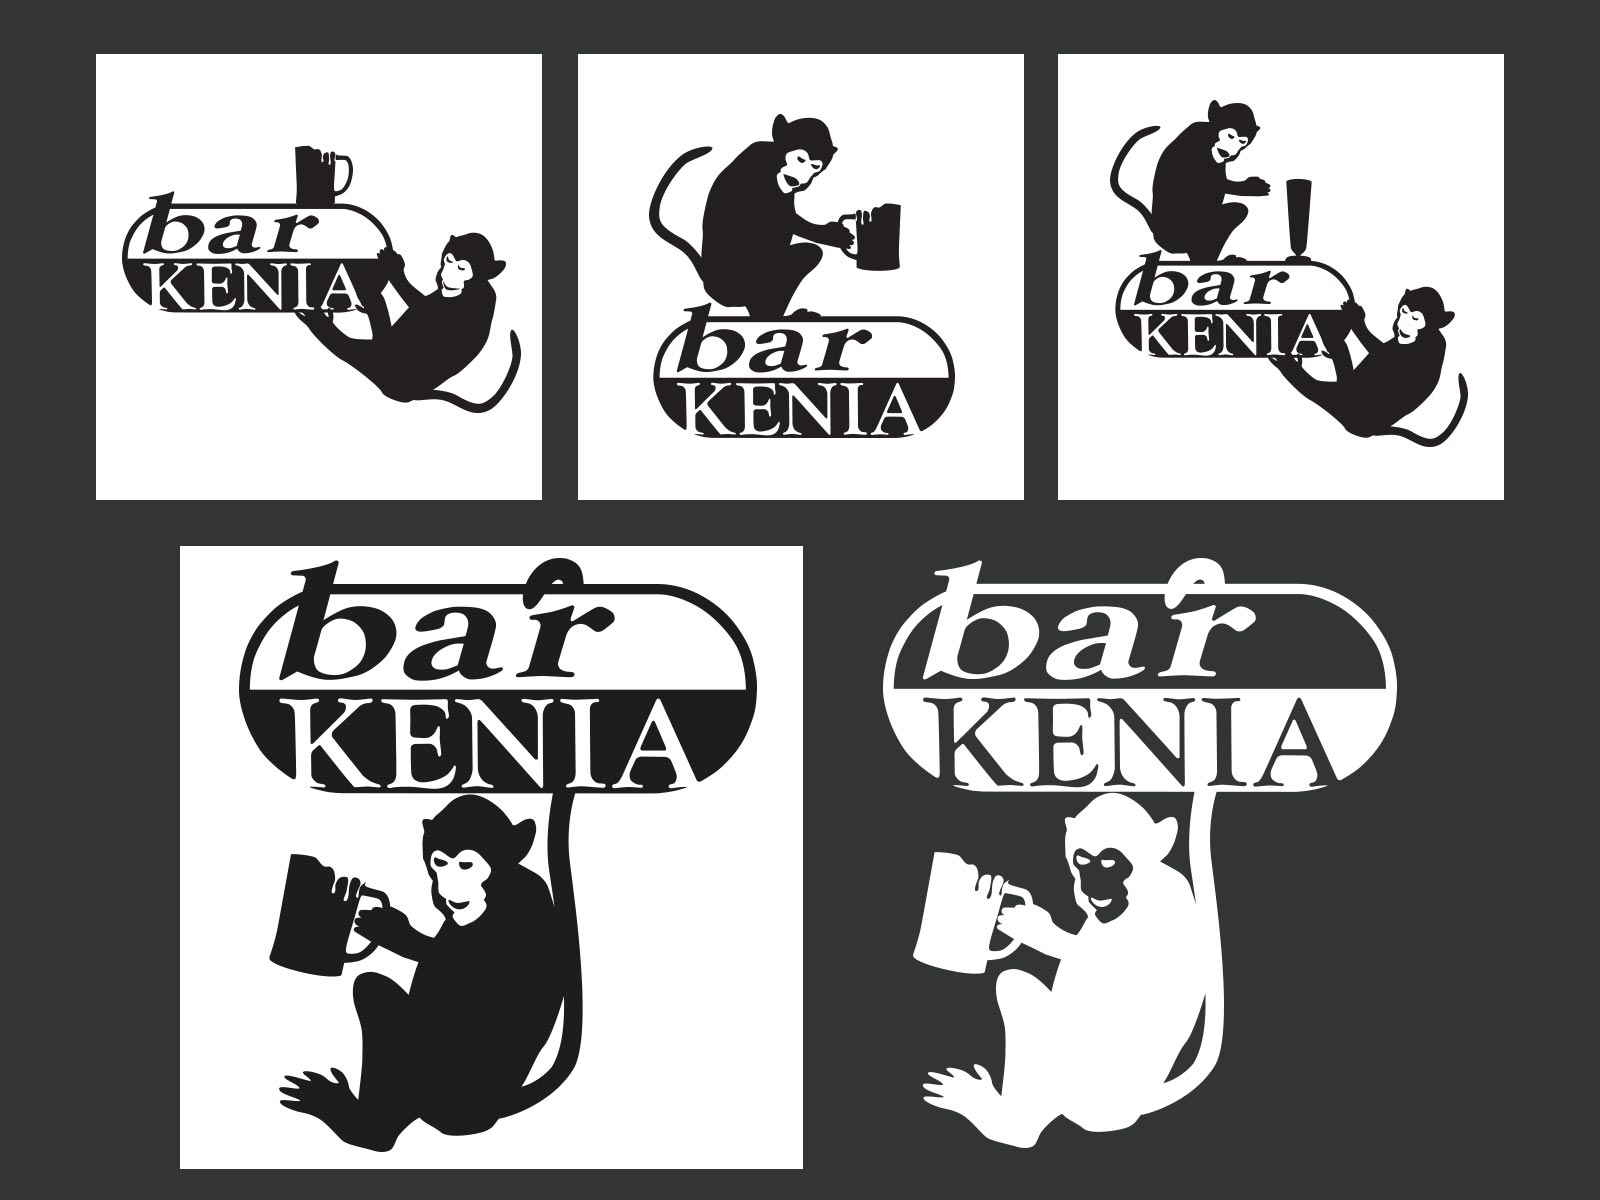 pic-barkenia-logo